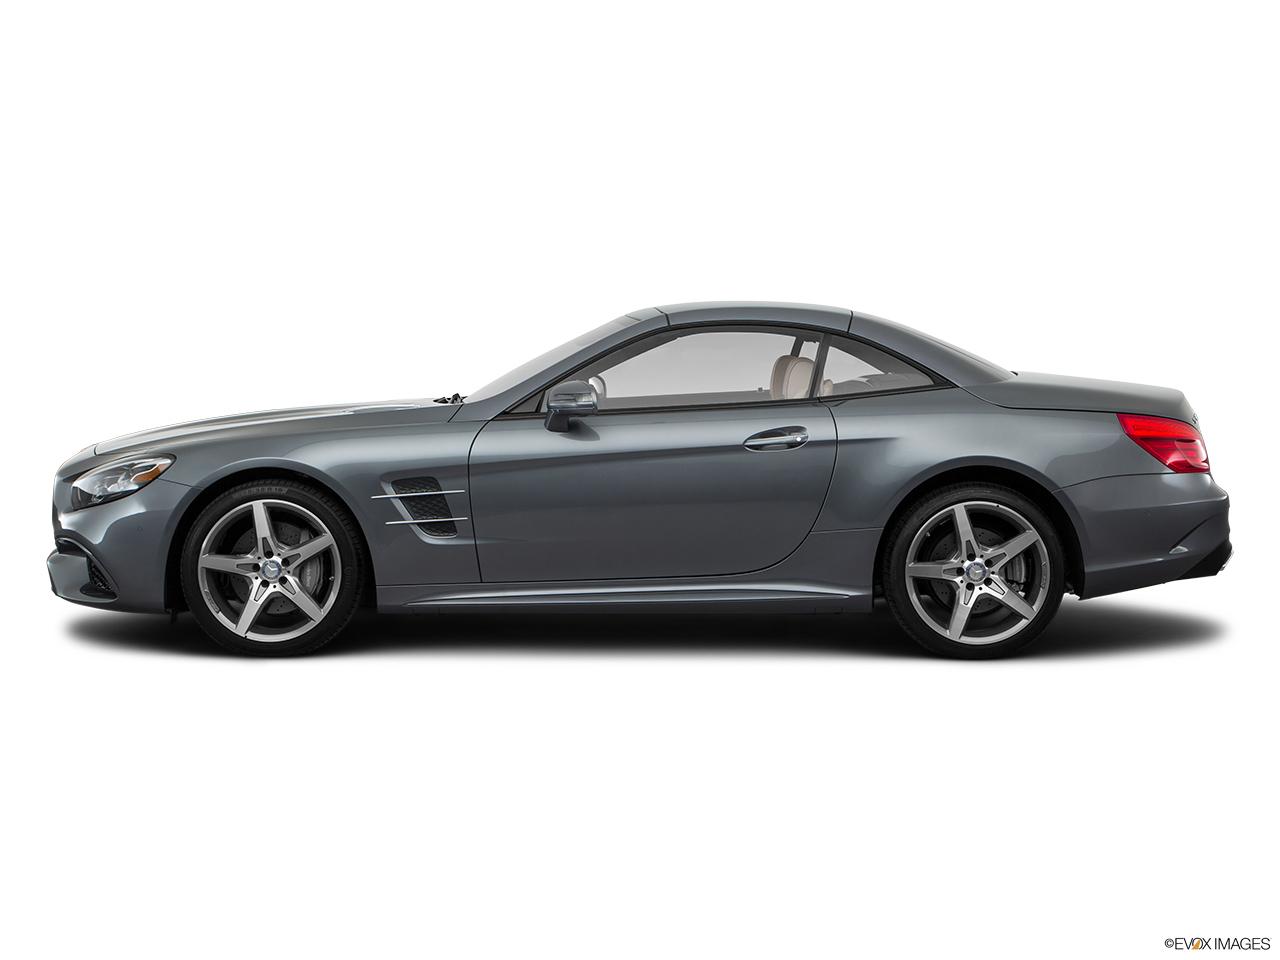 Car pictures list for mercedes benz sl class 2018 sl 400 for Mercedes benz payment estimator